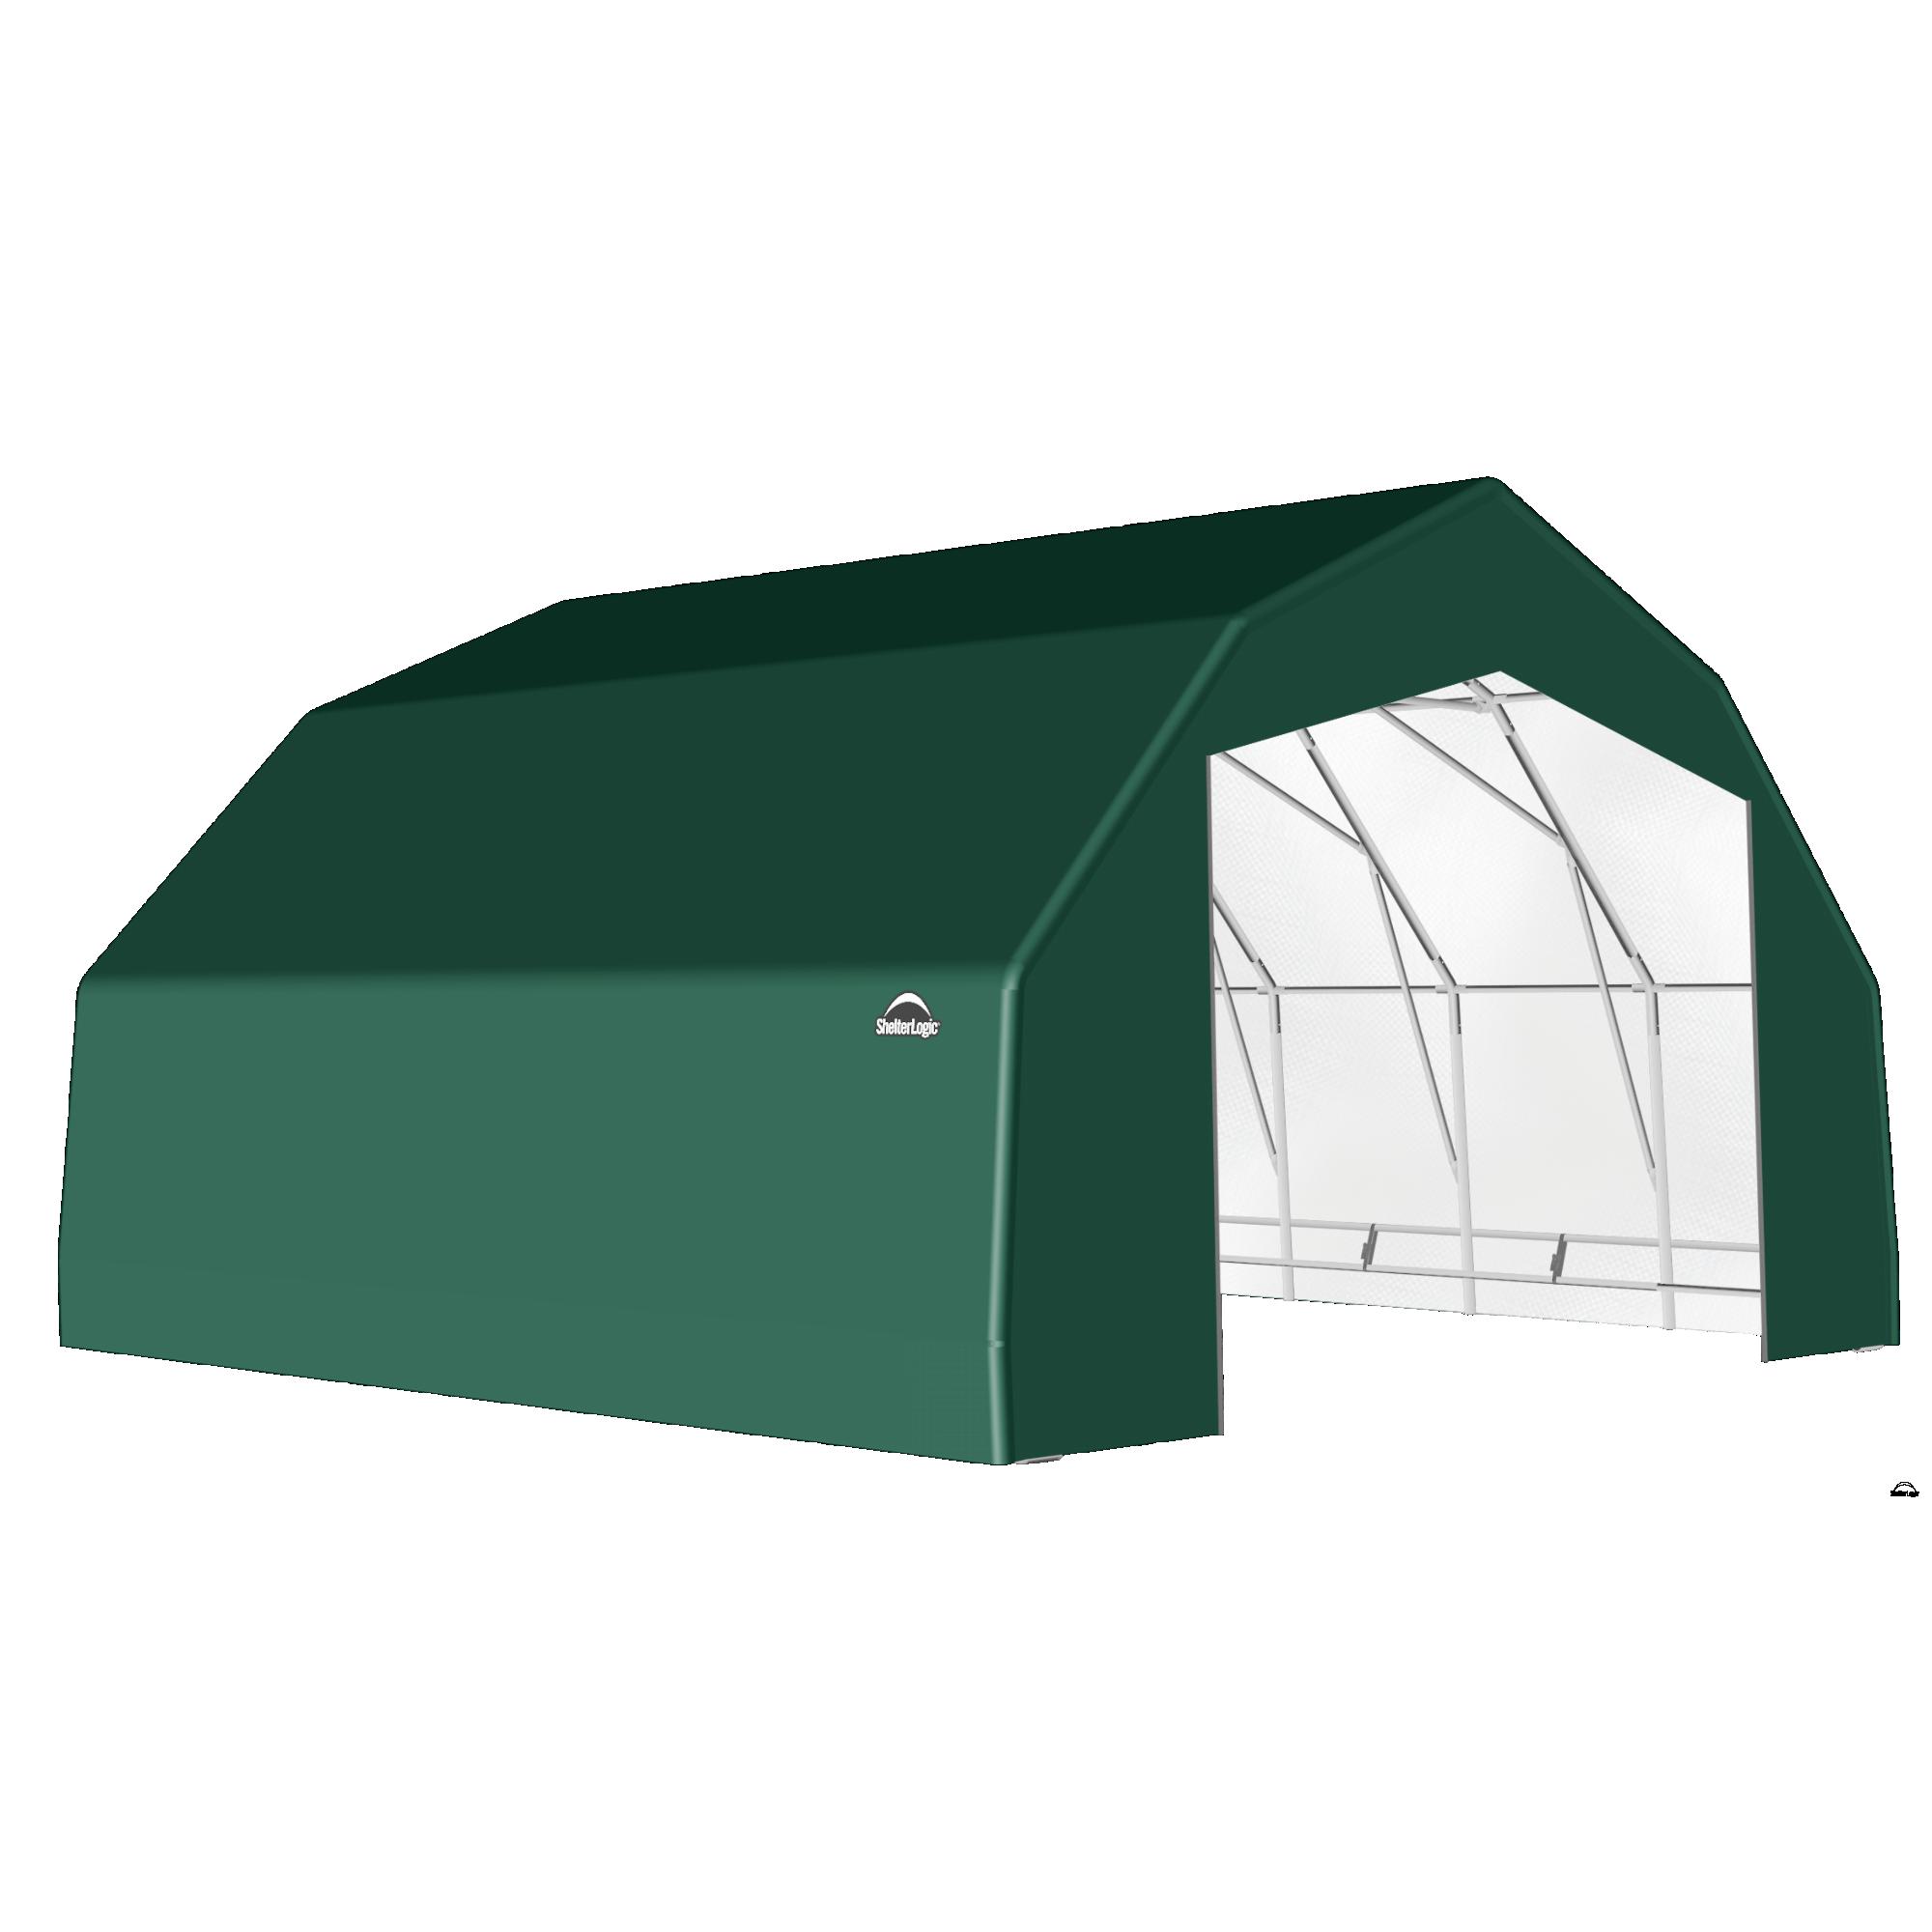 SP Barn 25X28X14 Green 14 oz PE Shelter